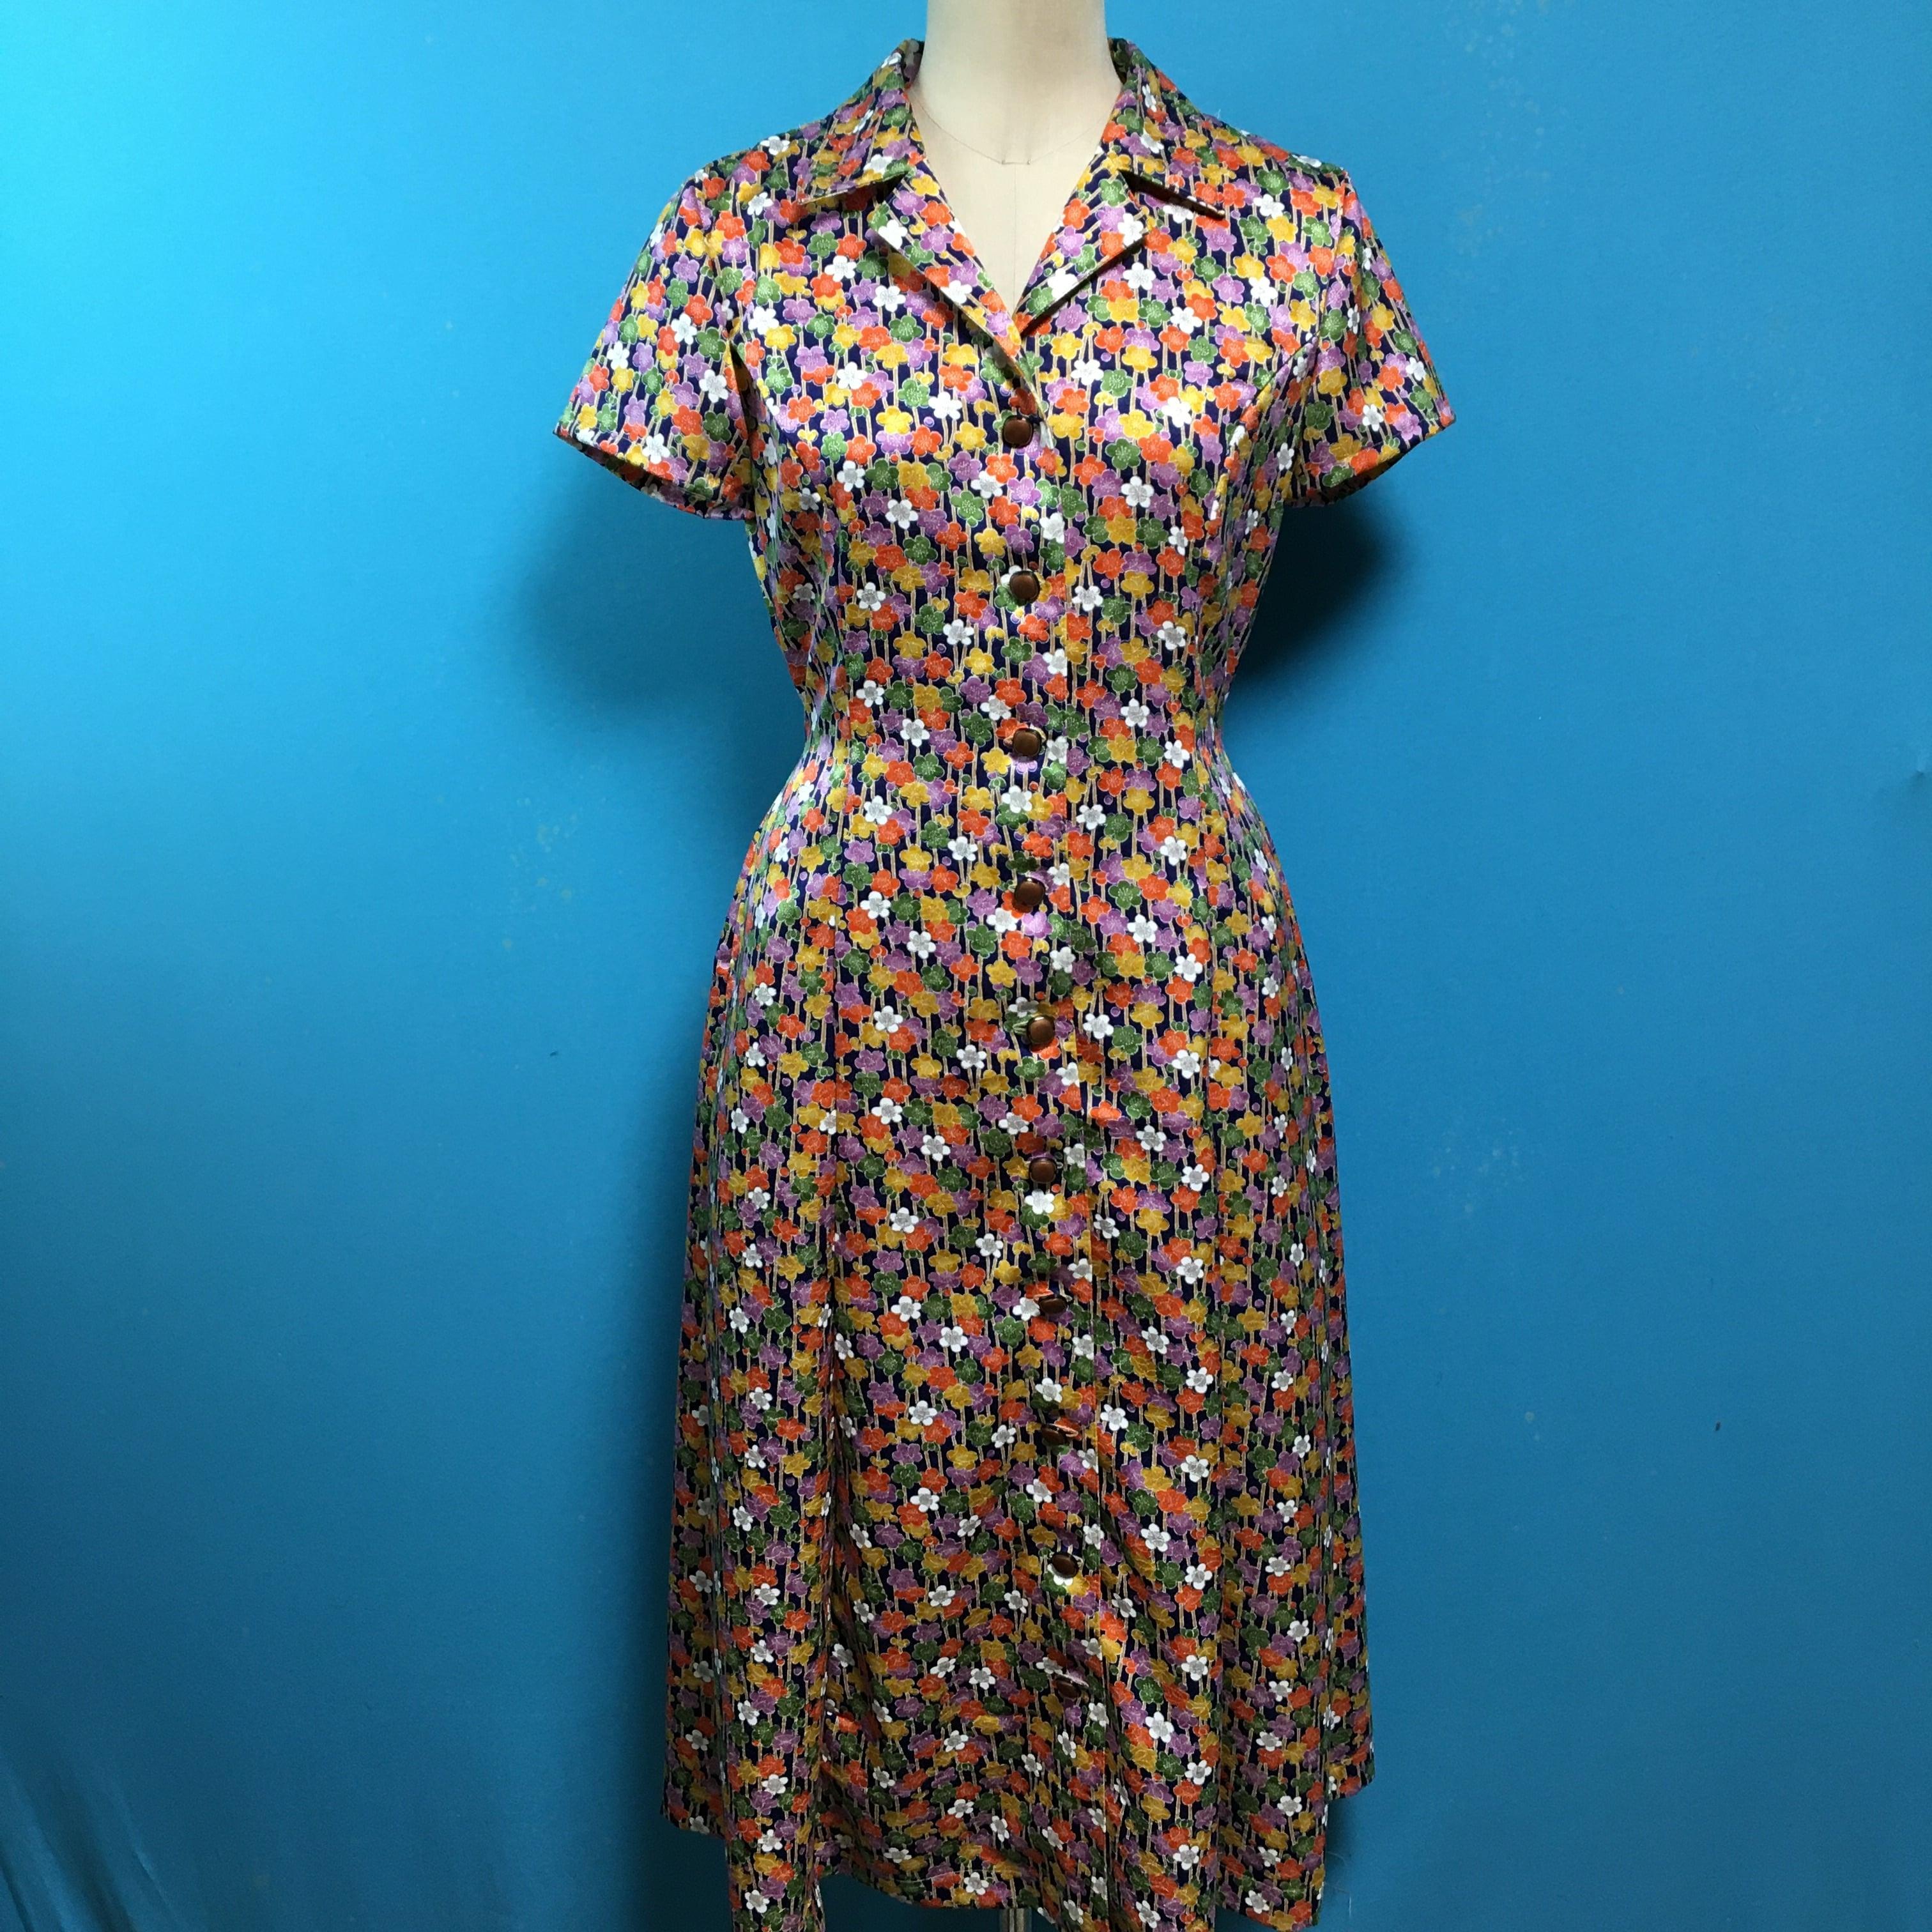 Vintage 着物 サイドポケットのレトロワンピース 梅